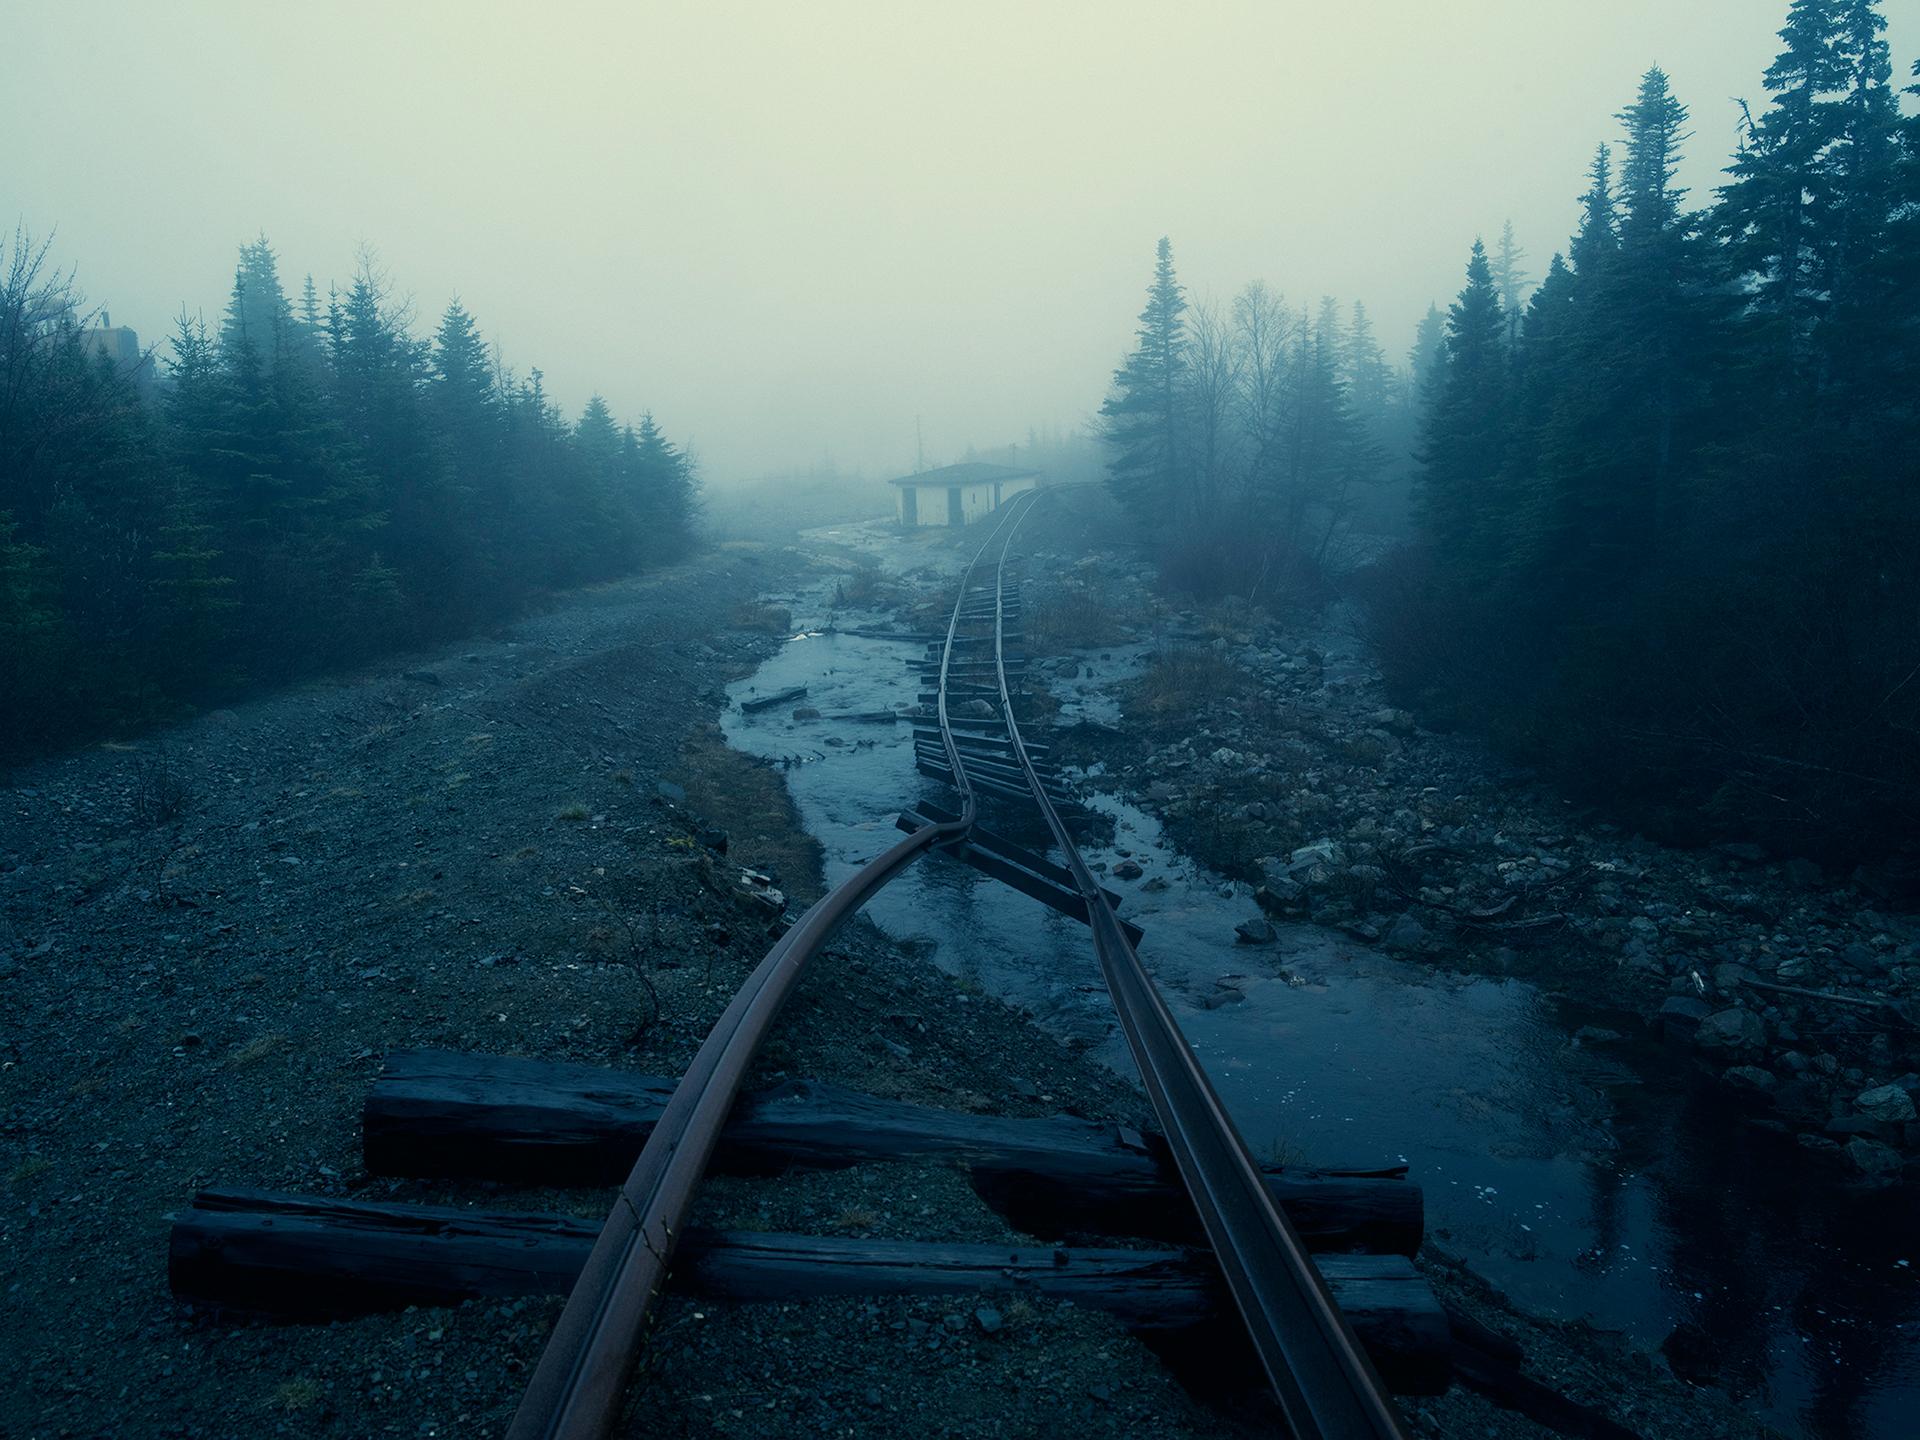 General 1920x1440 forest railway abandoned mist ruin ruins gloomy